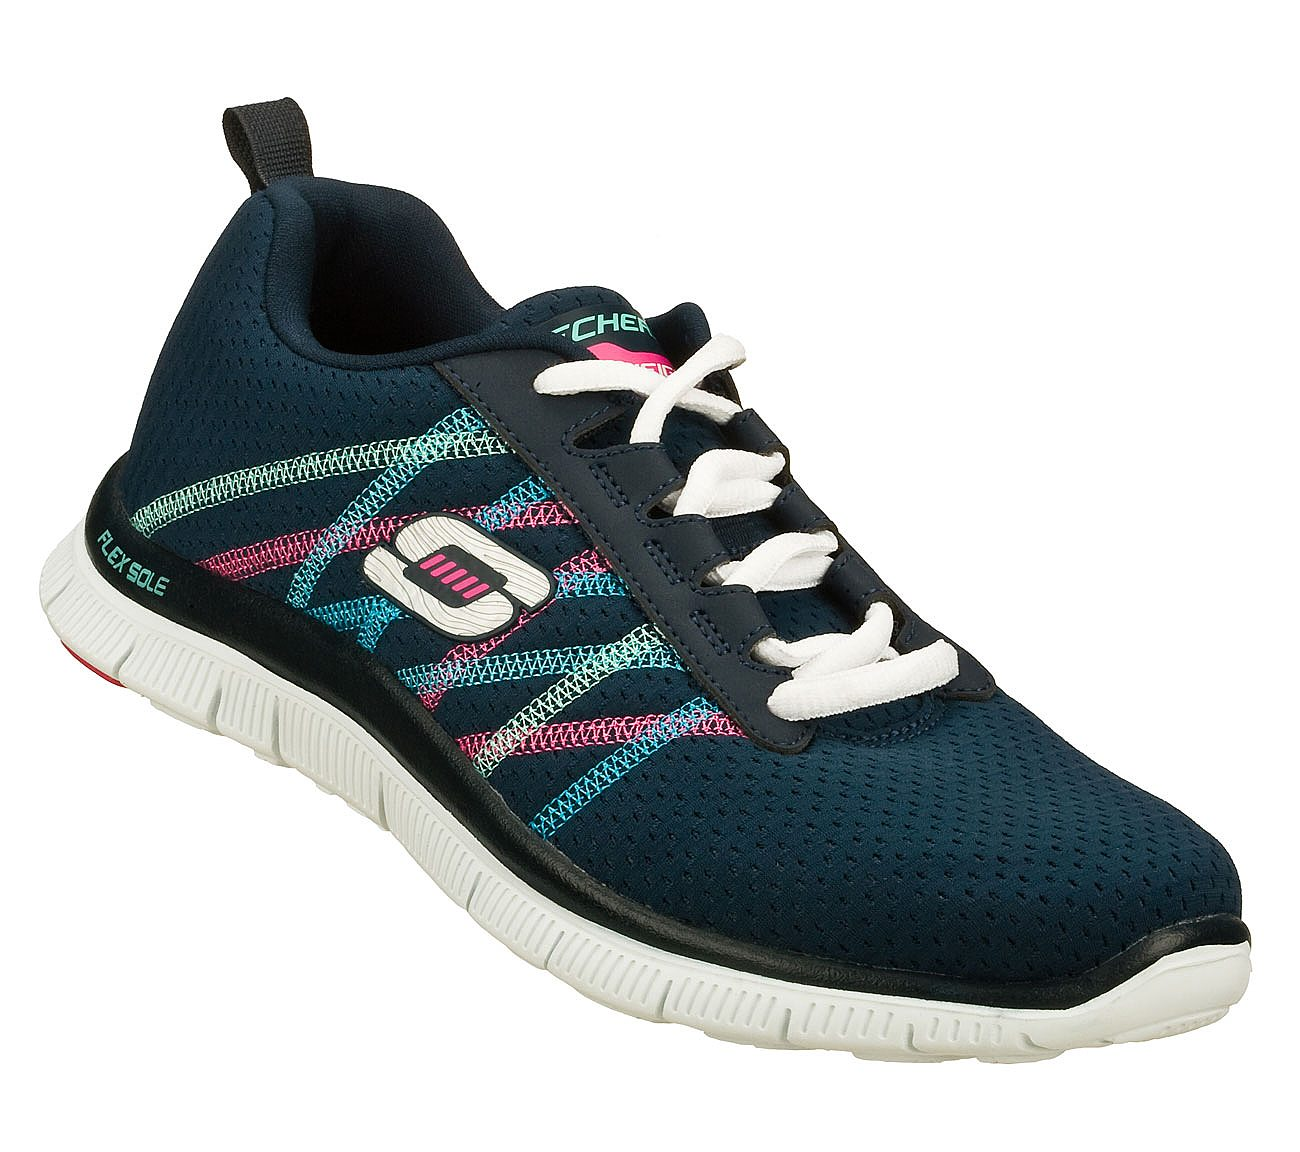 Buy SKECHERS Flex Appeal Something Fun Flex Appeal Shoes eXFmN